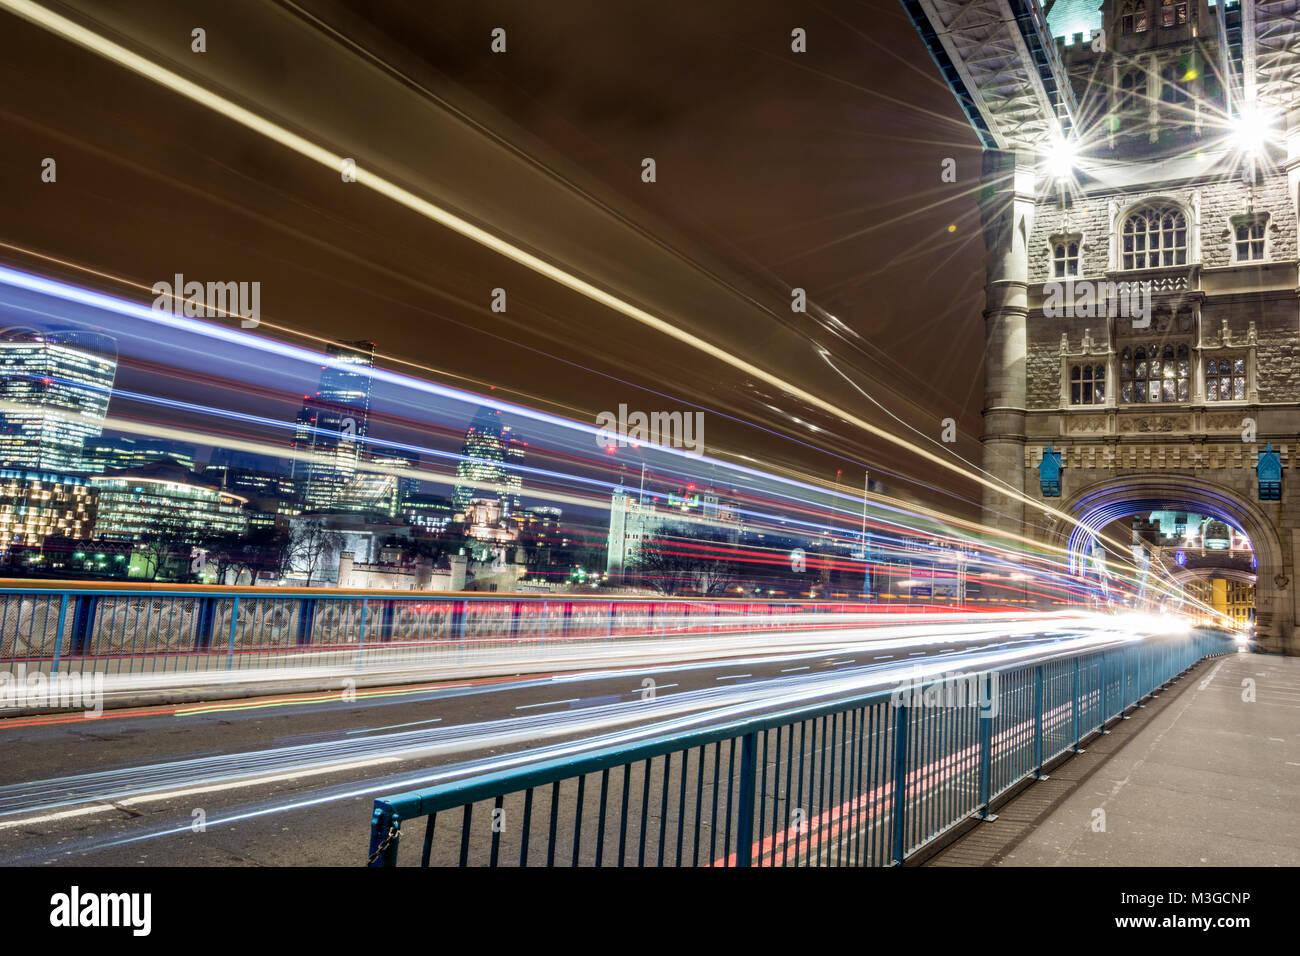 The Rush Hour - Tower Bridge, London - Stock Image